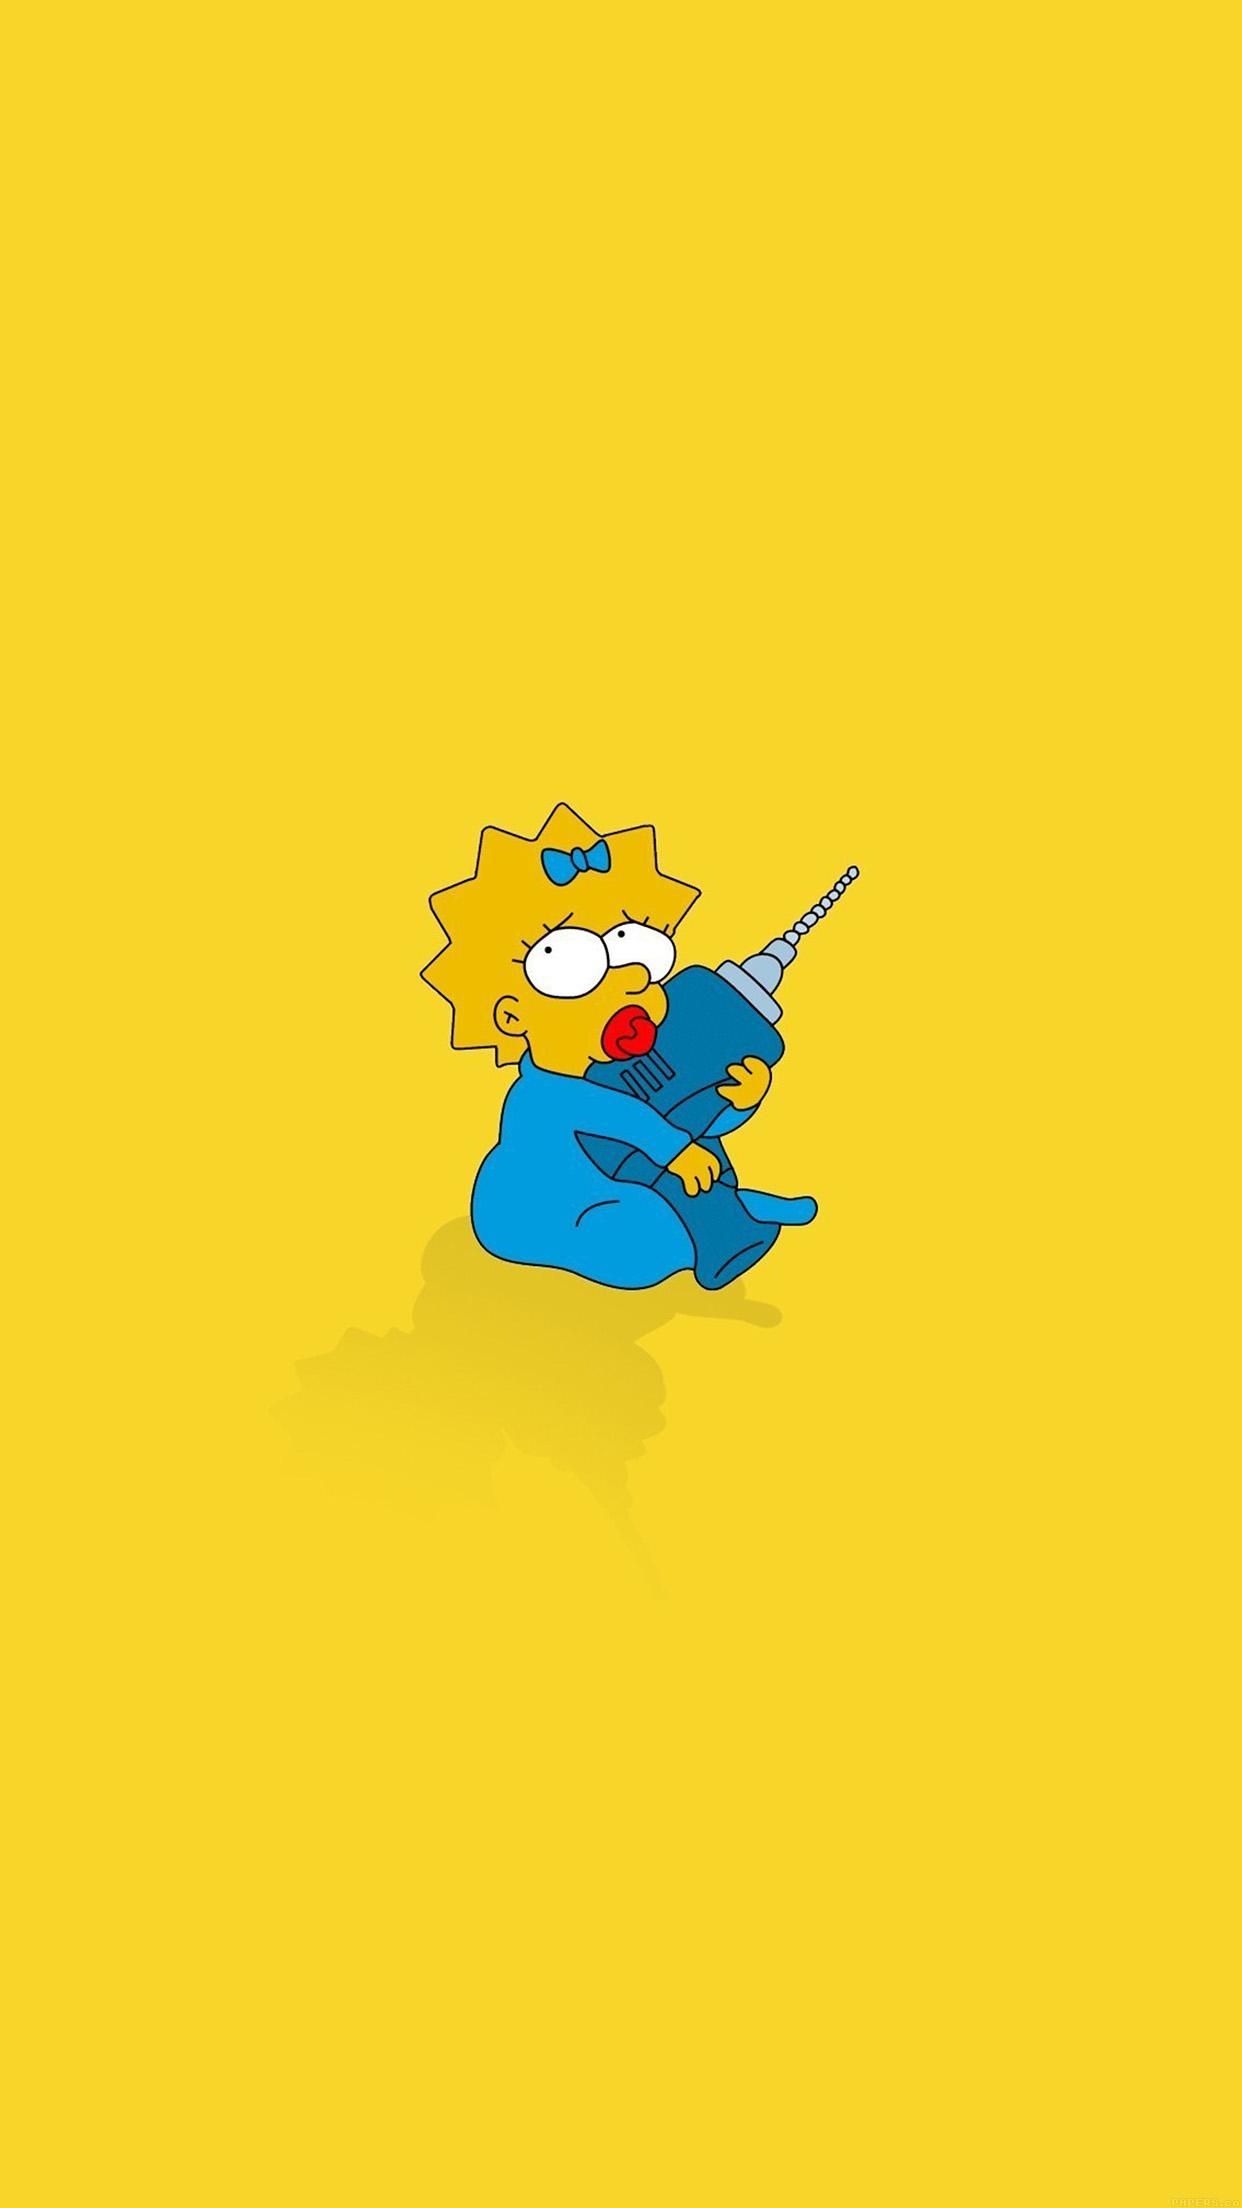 Iphone7papers Af69 Simpsons Maggie Cute Illust Cartoon Art